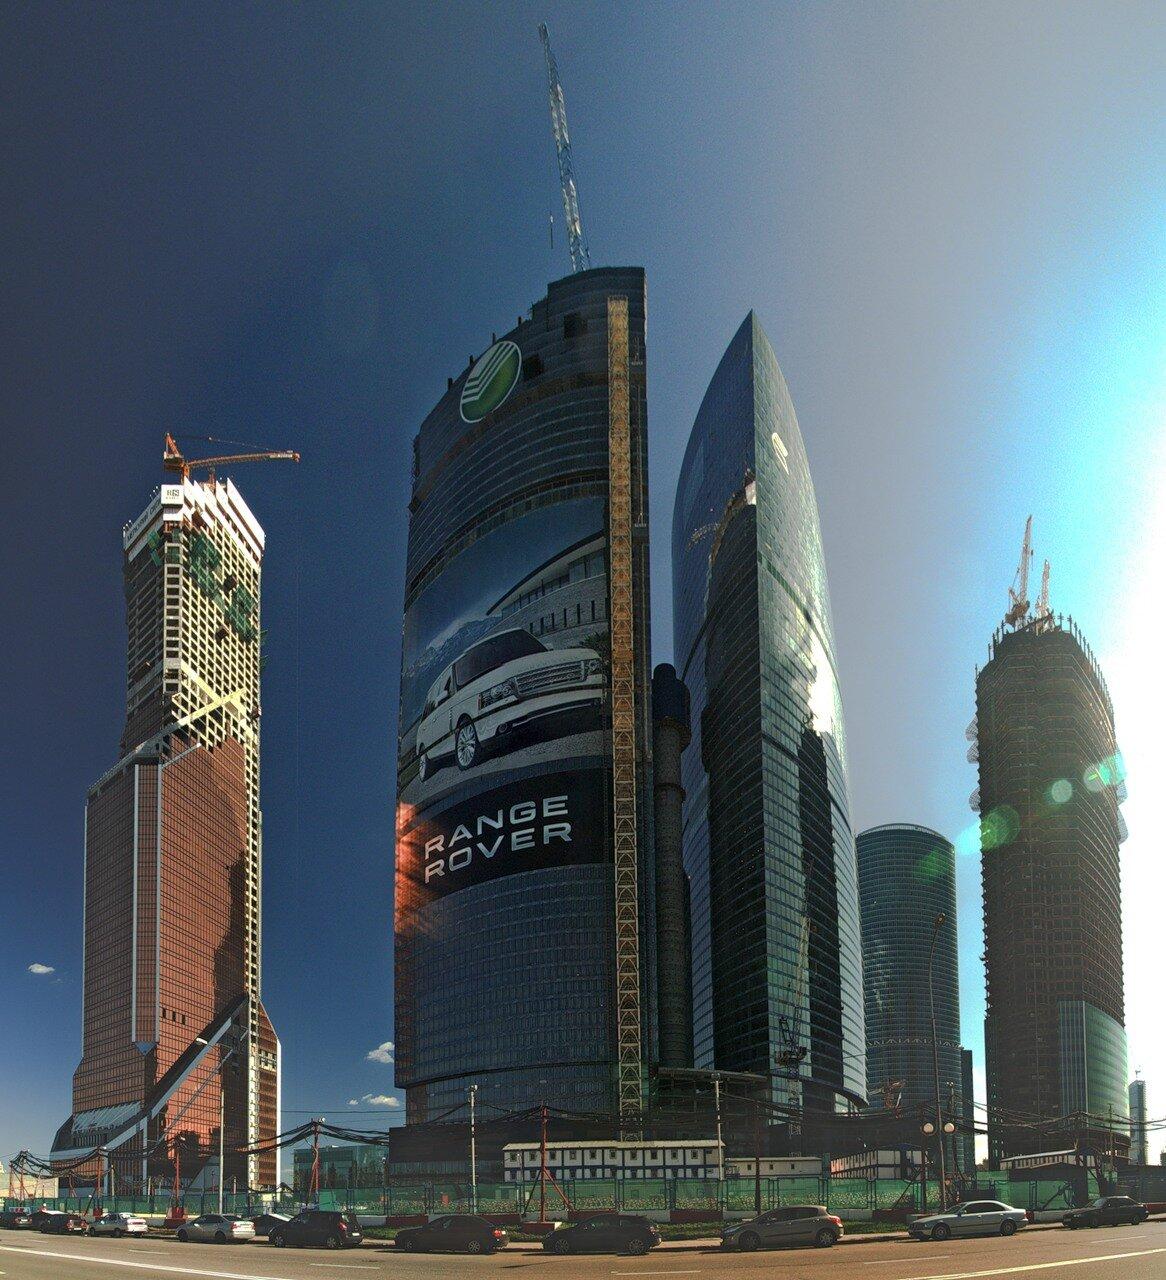 http://img-fotki.yandex.ru/get/4409/50484535.53/0_515f0_85ae95bf_XXXL.jpg